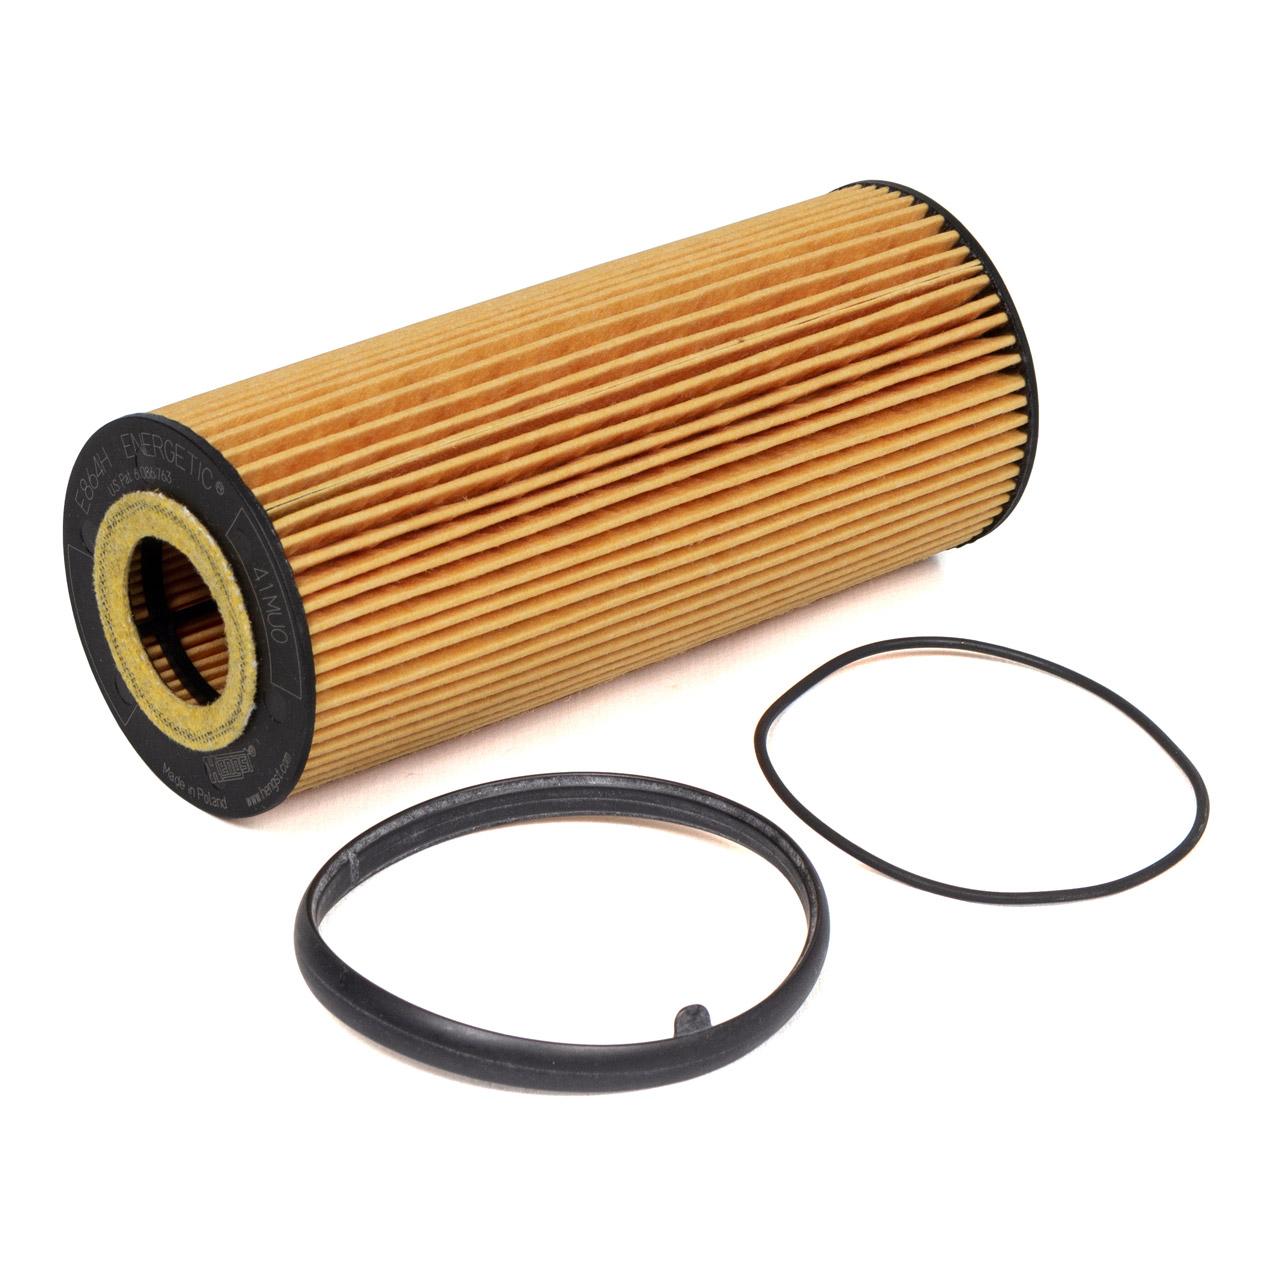 Inspektionskit Filterpaket für AUDI A8 (4E) 2.8 FSI 210 PS + 3.2 FSI 260 PS